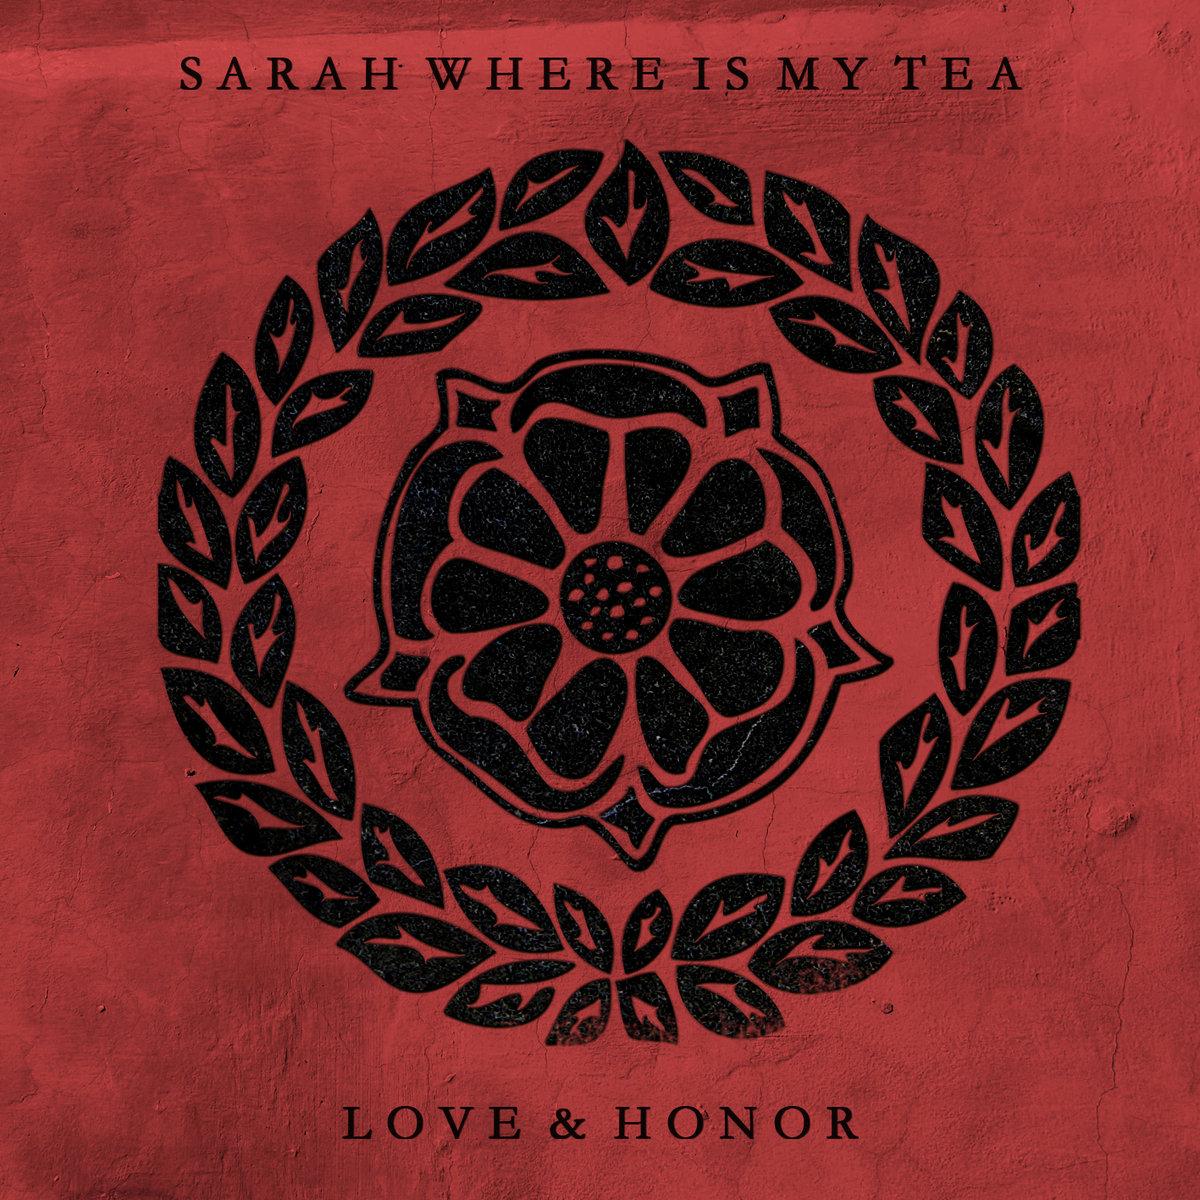 Sarah Where Is My Tea - Love And Honor